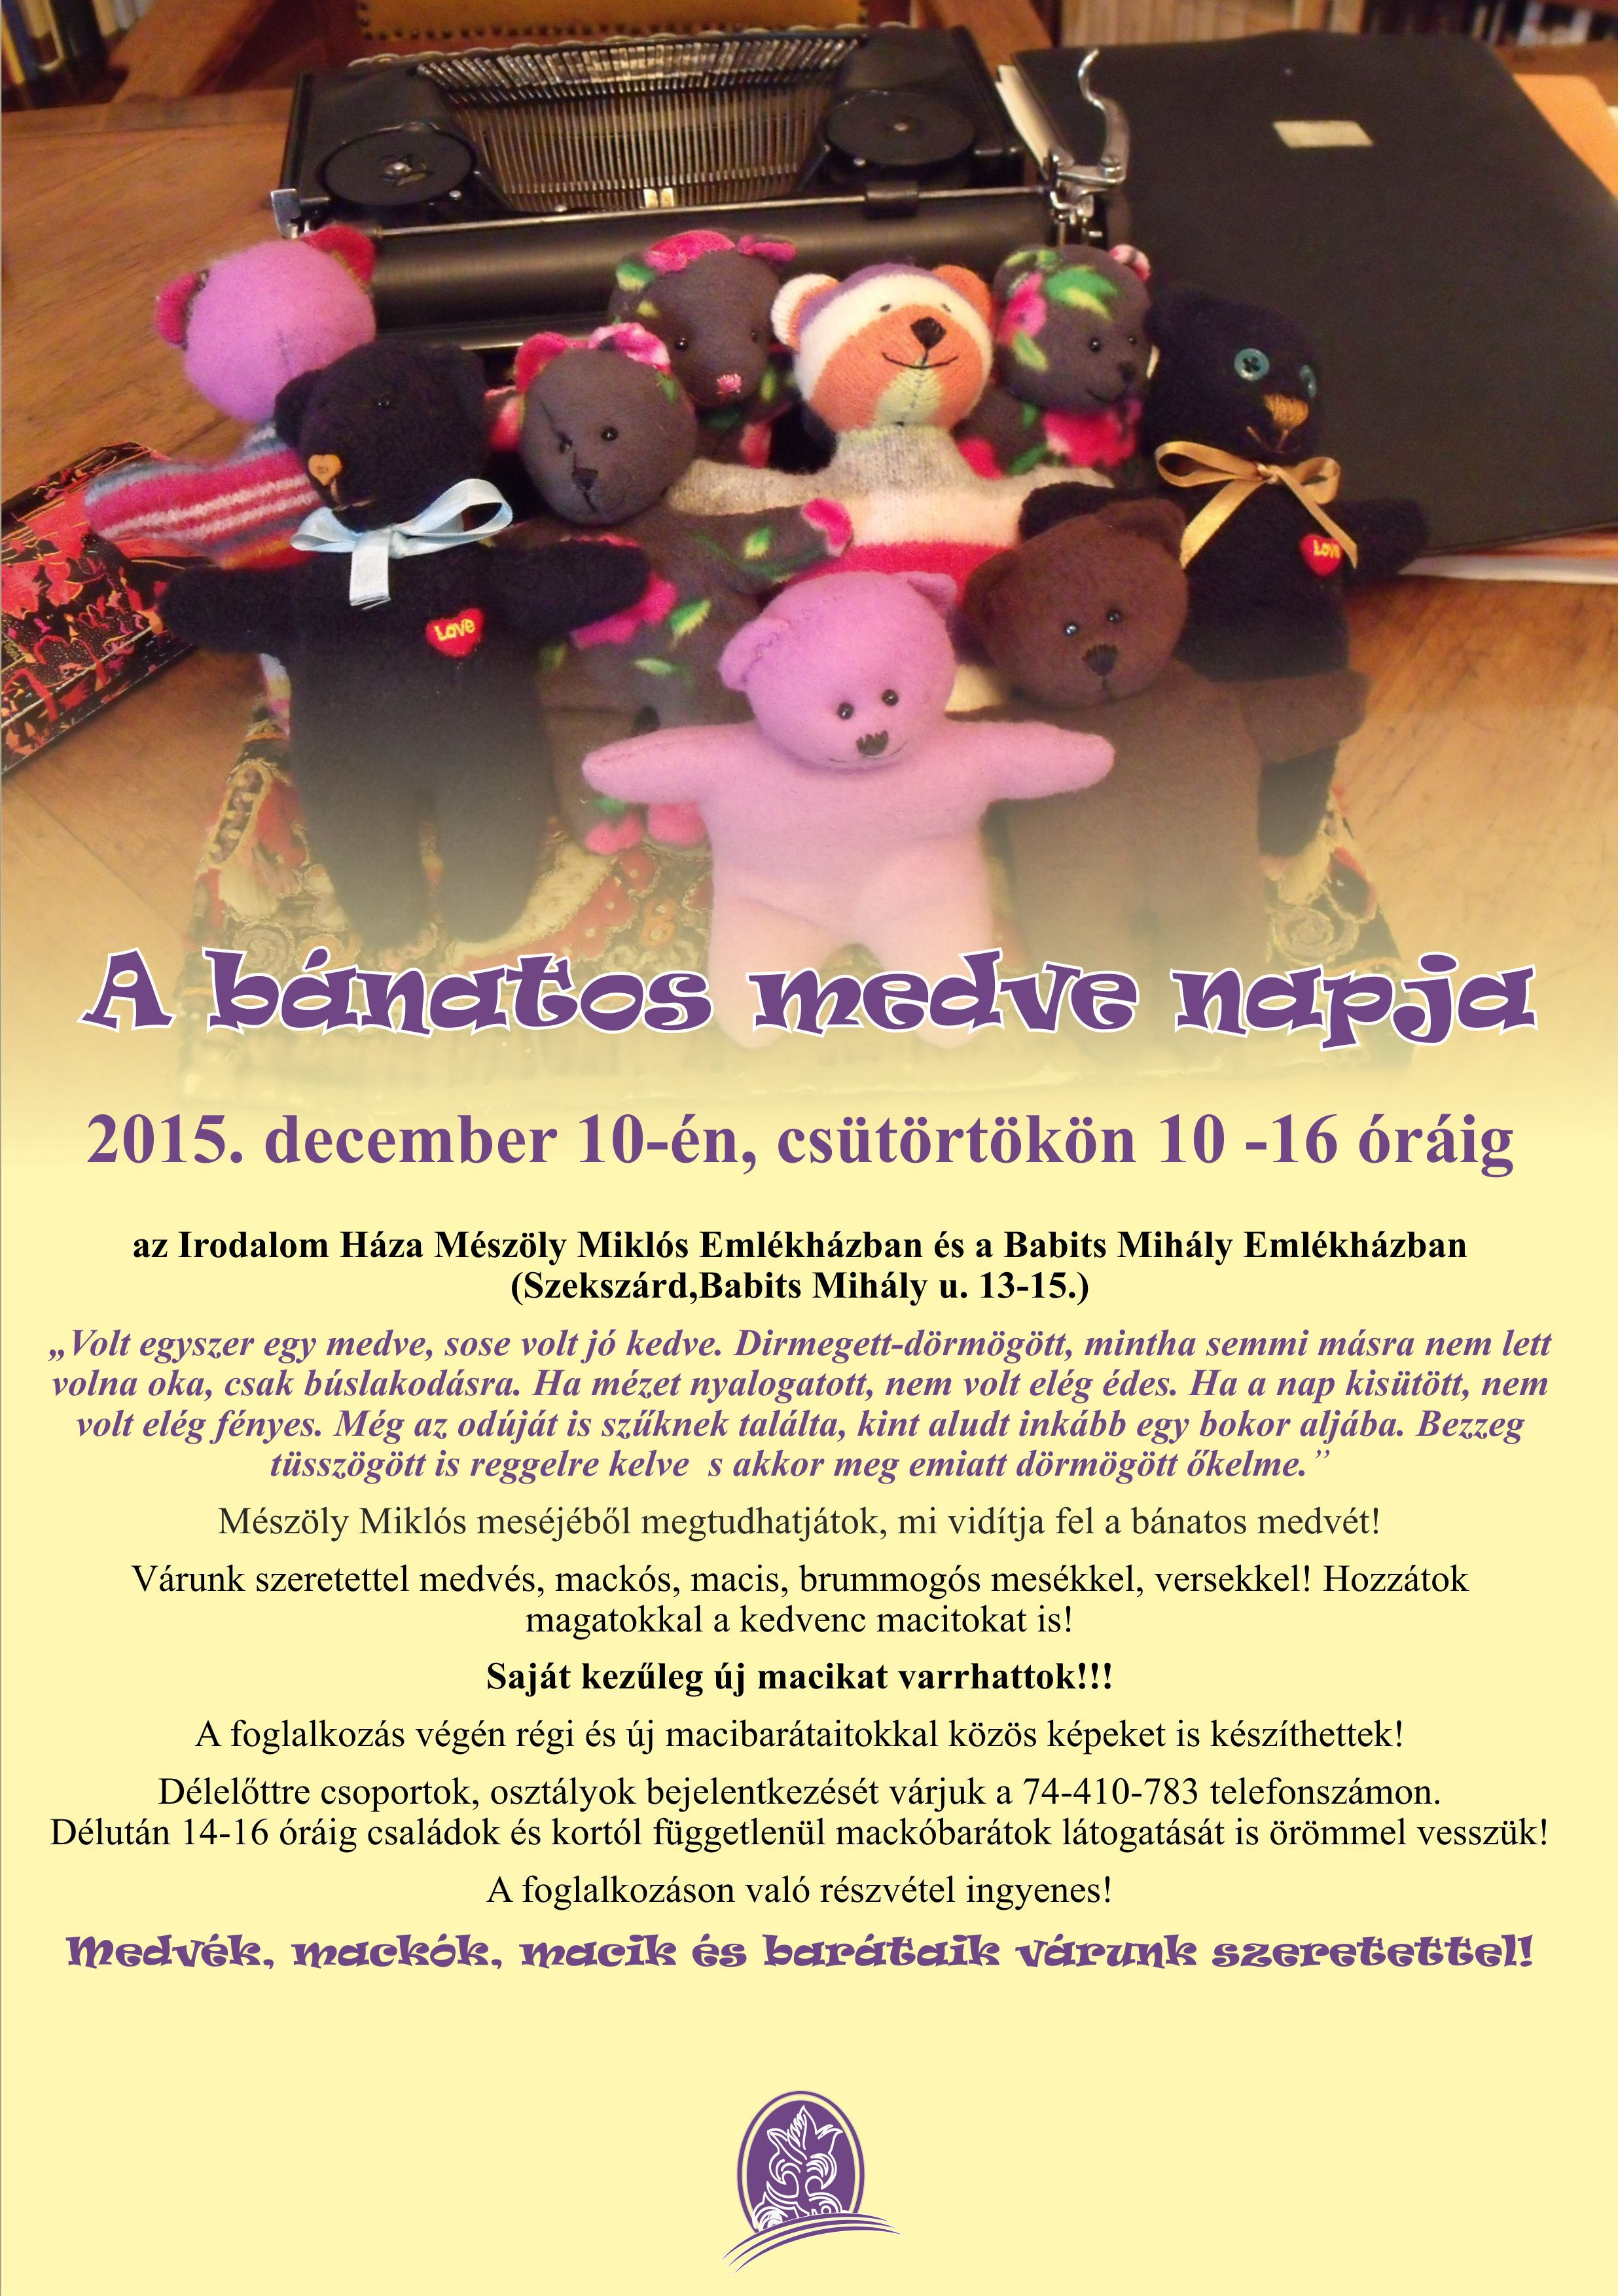 bánatos medve2015